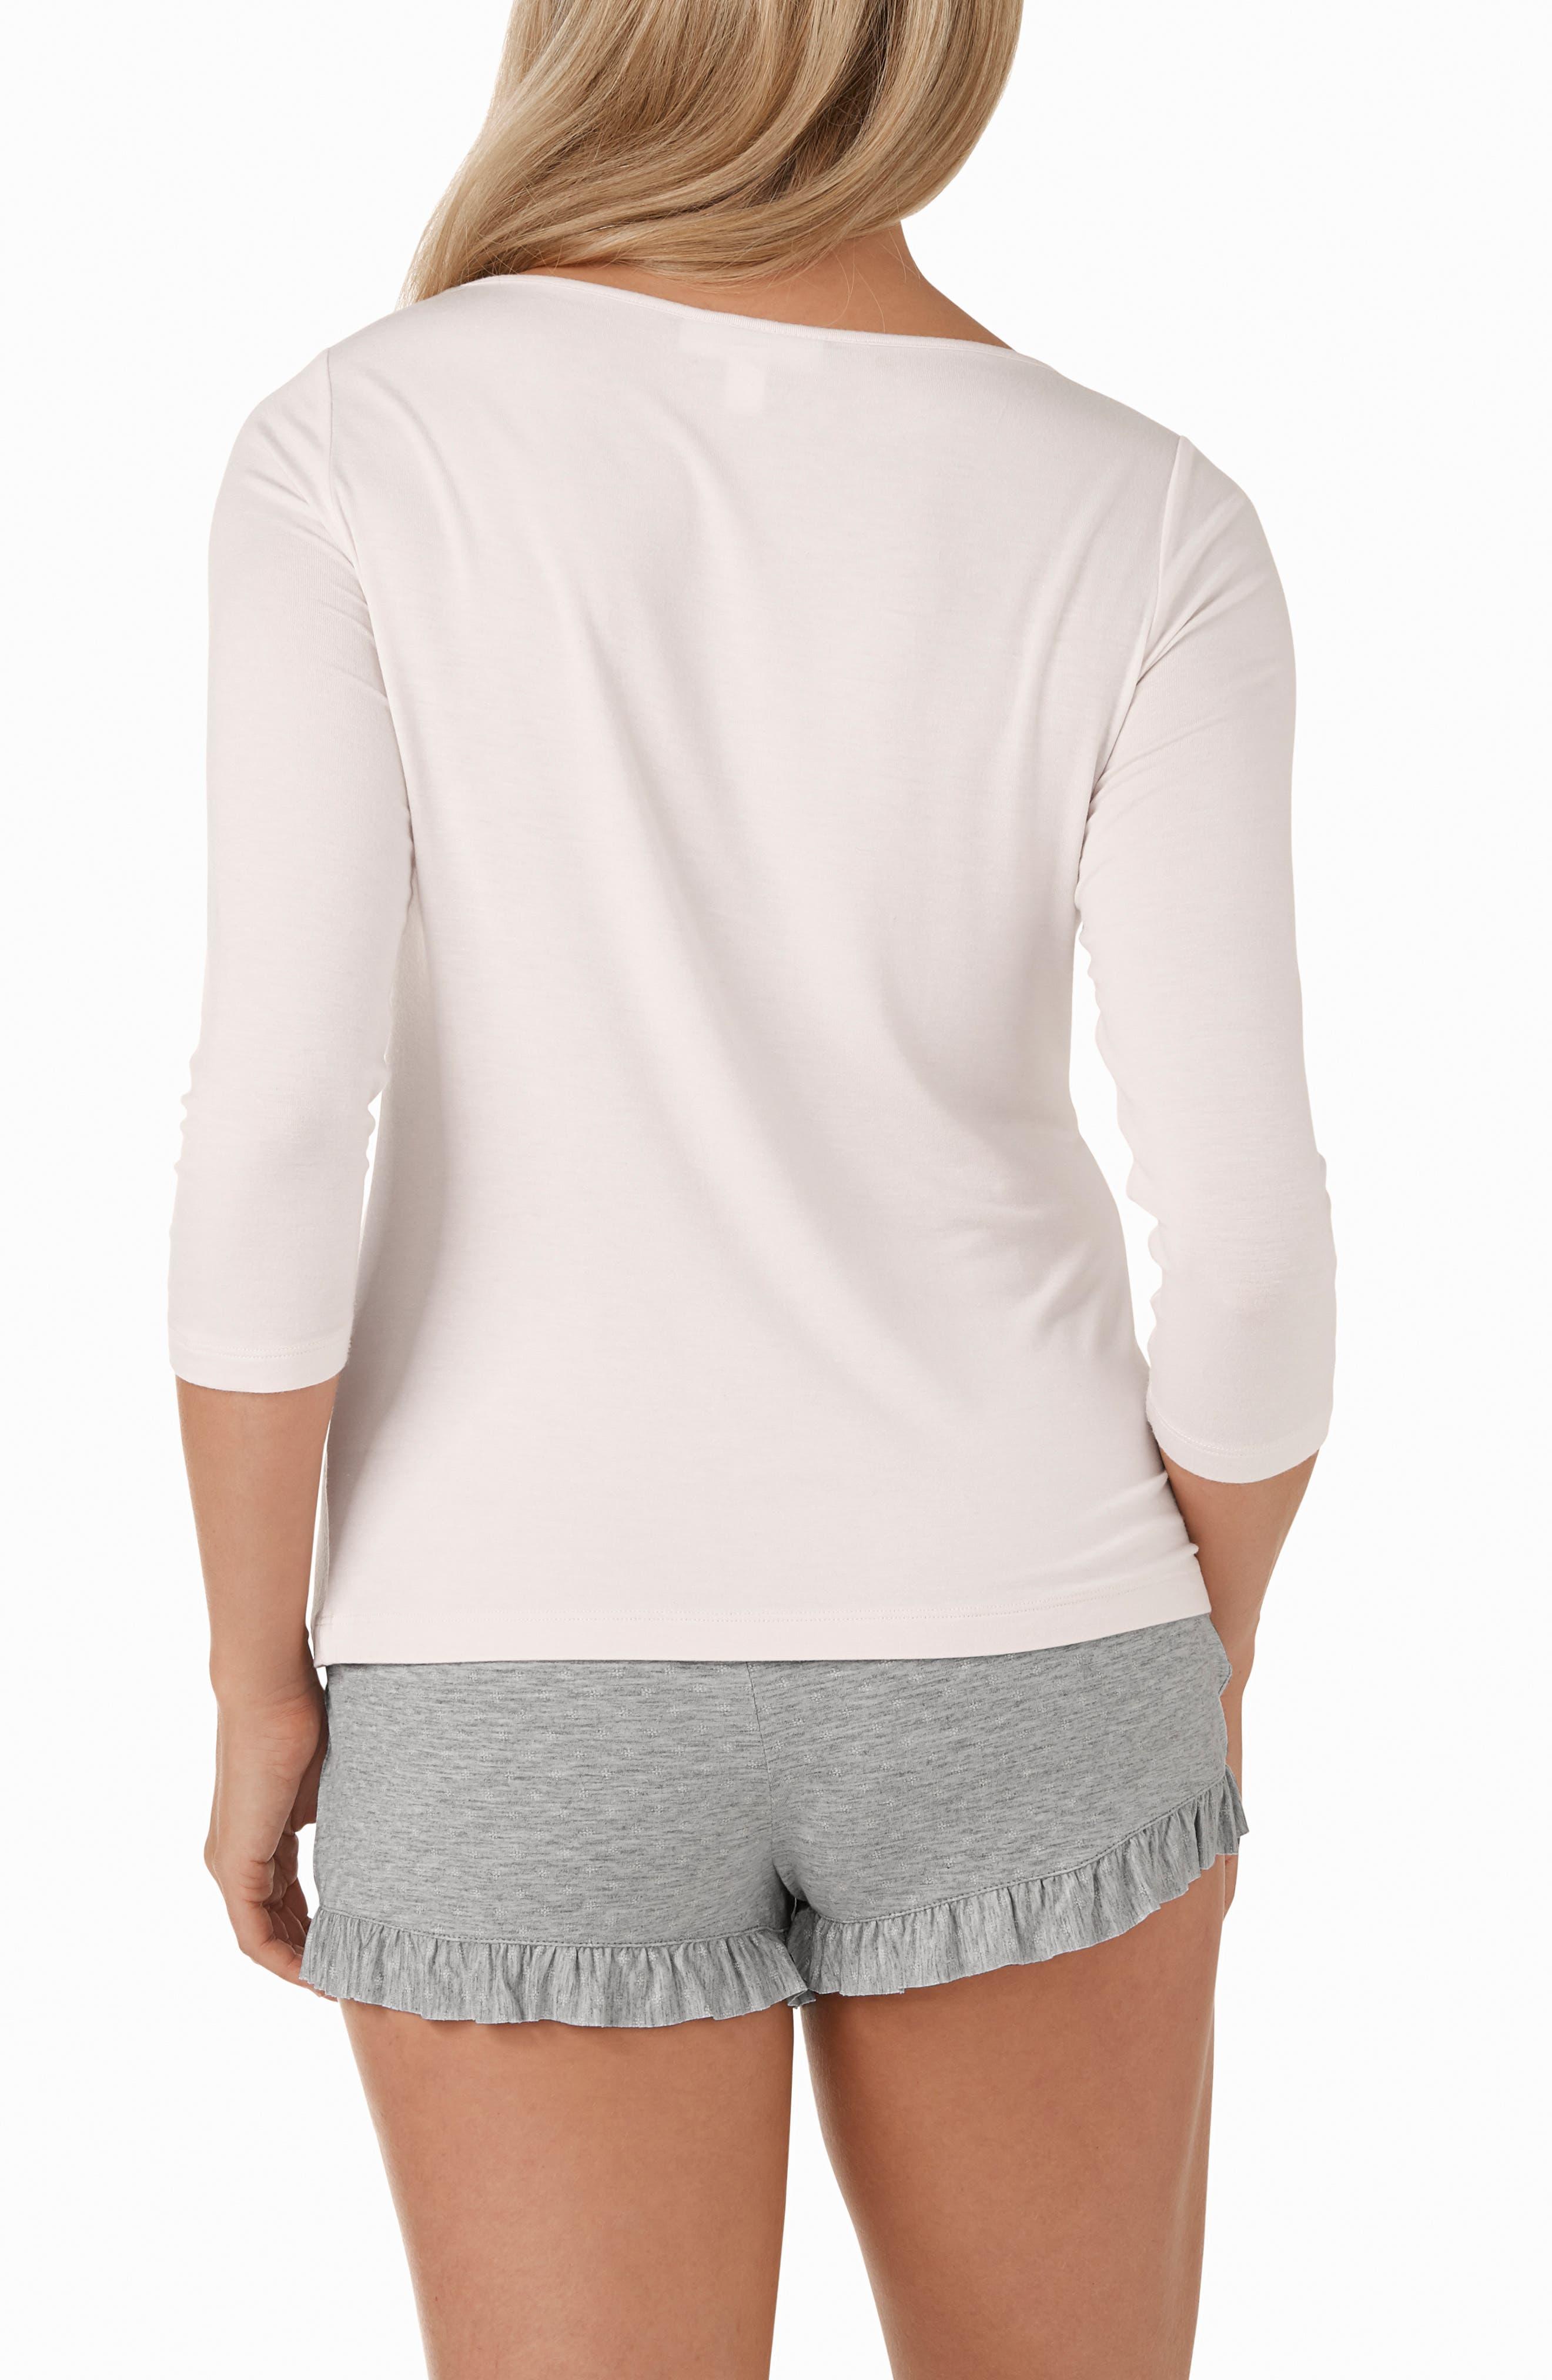 Foulard Star Two Piece Pajamas,                             Alternate thumbnail 2, color,                             PINK/ GREY / WHITE